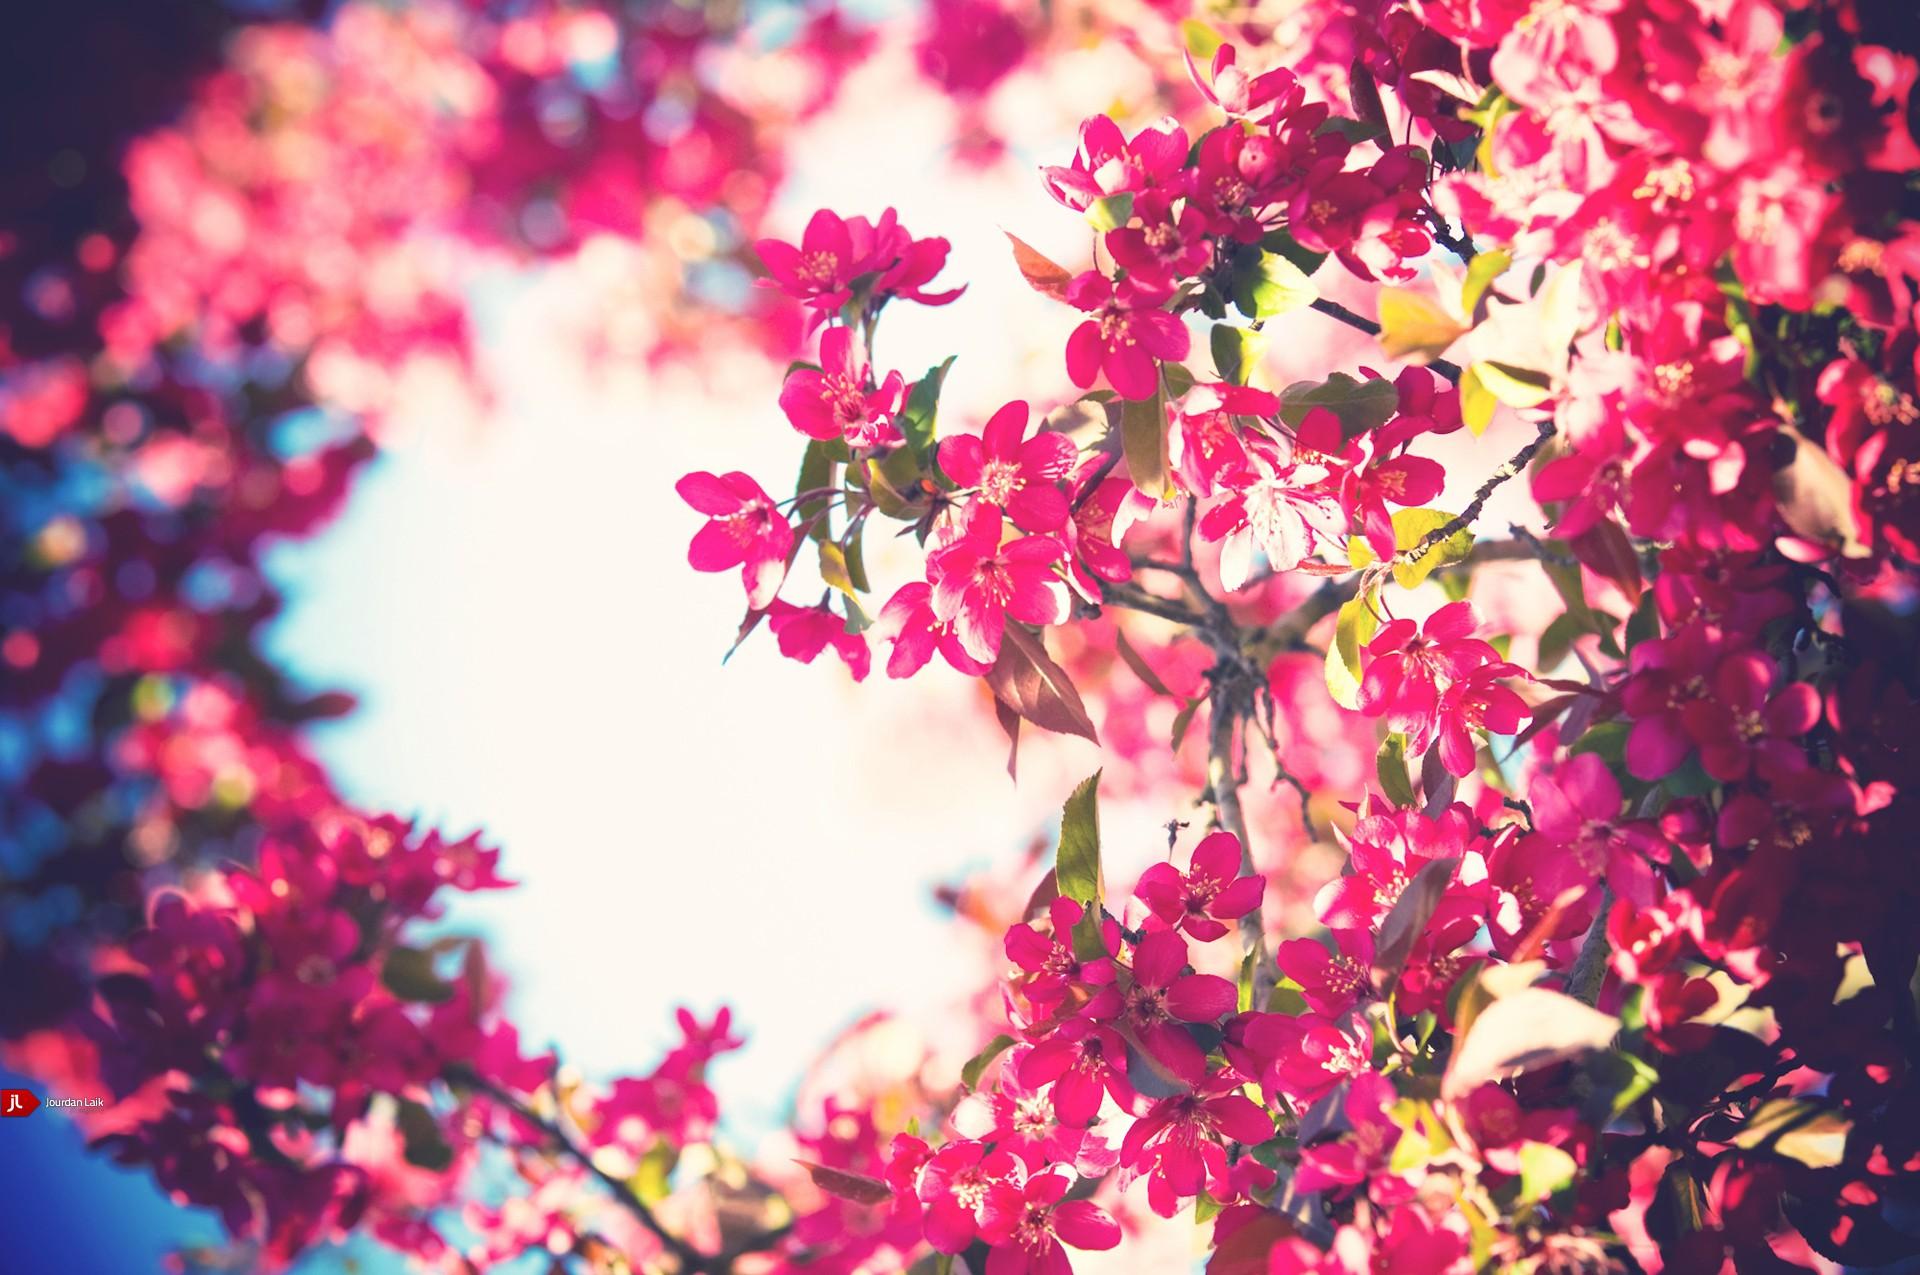 Flowers bloom bokeh pink flowers free wallpaper wallpaperjam mightylinksfo